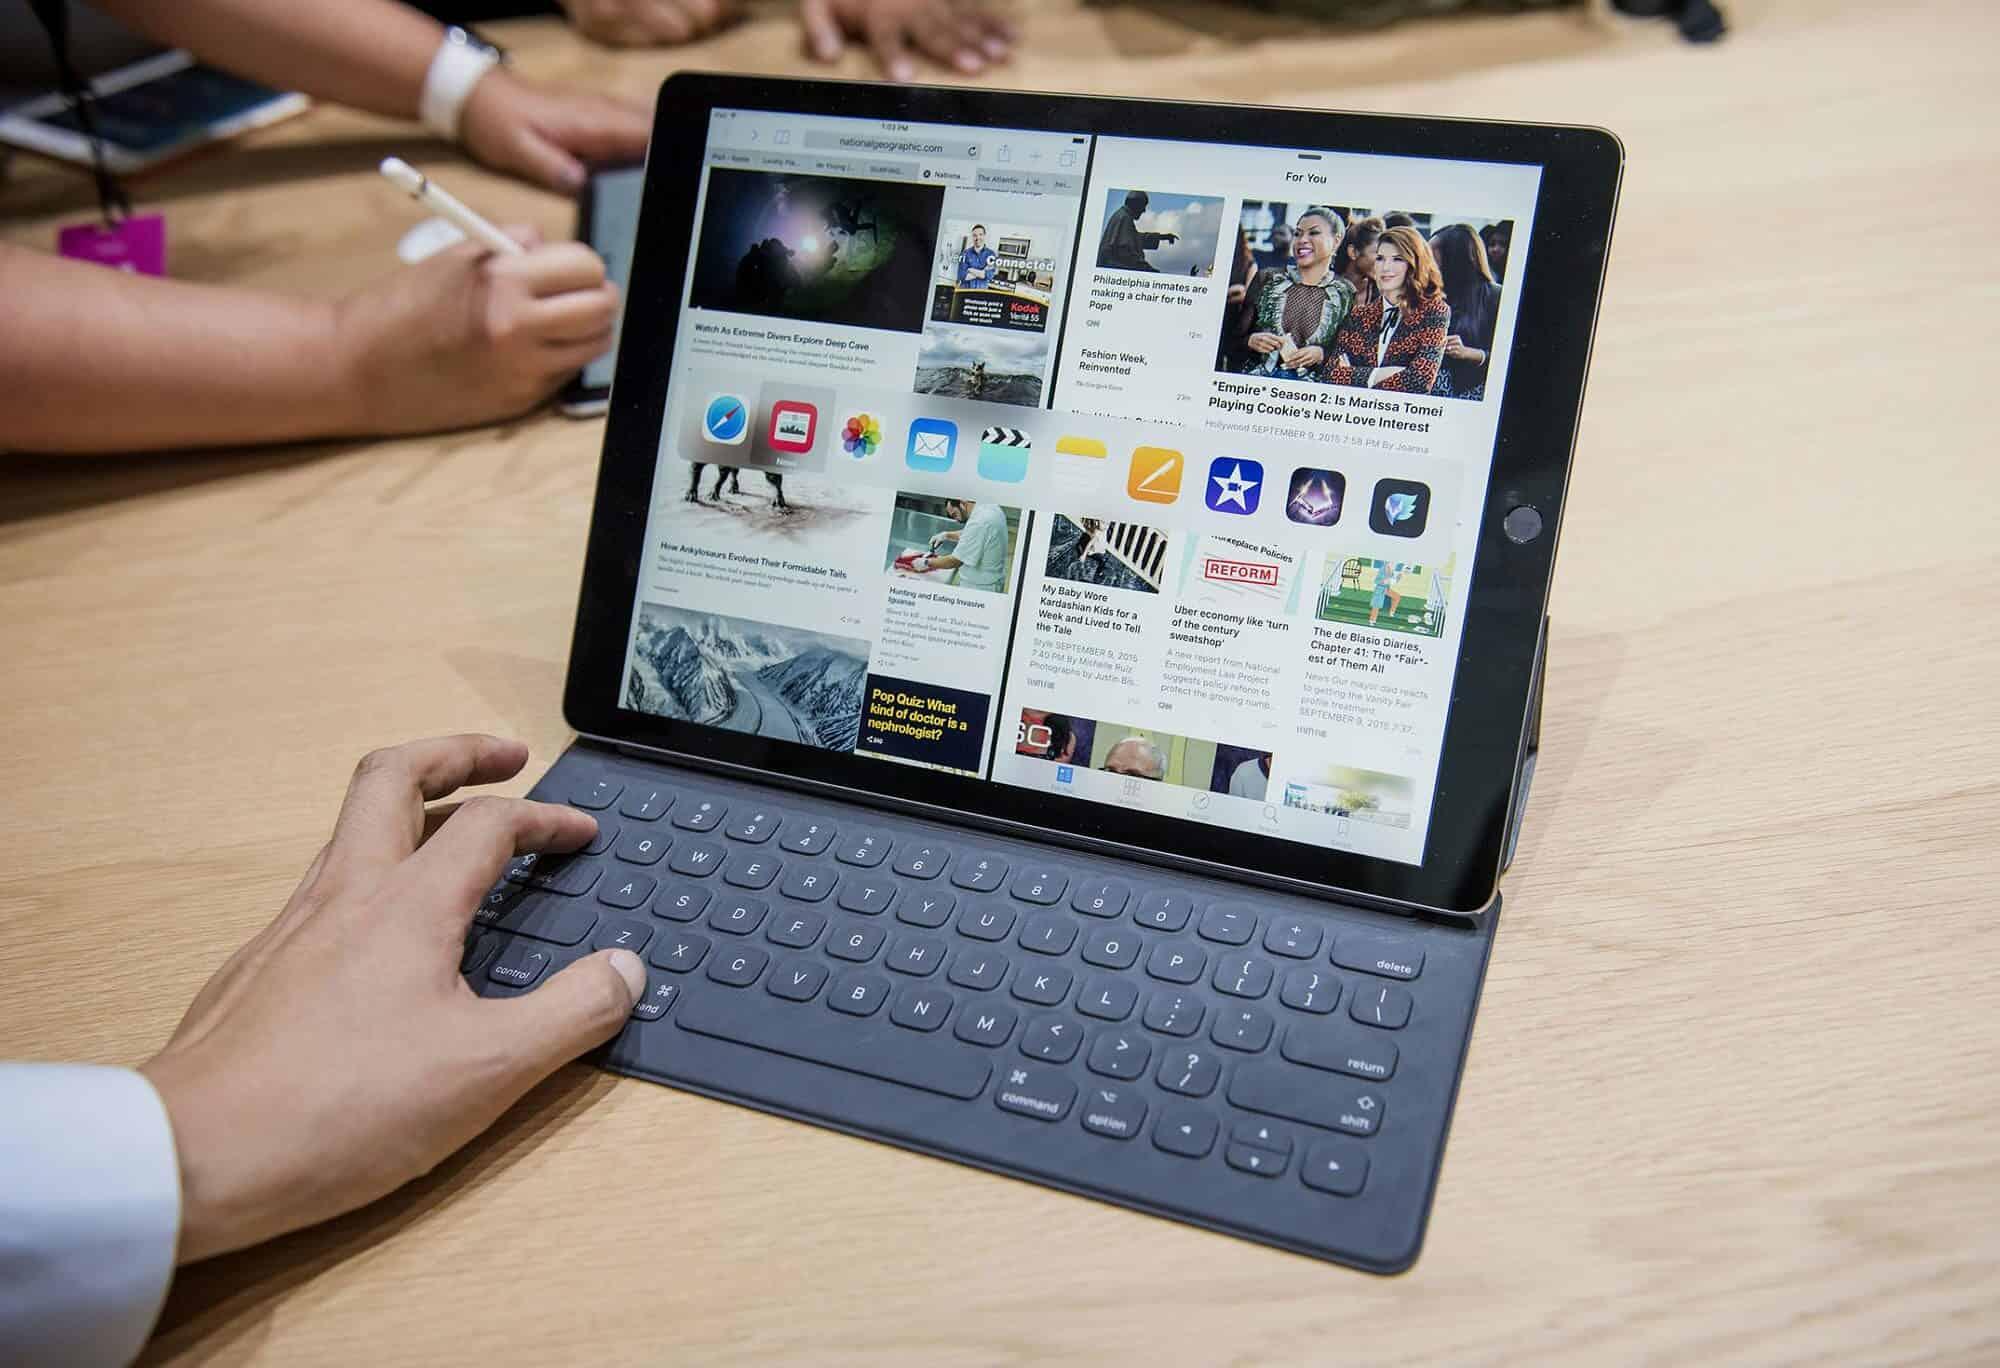 Lego, iPad Drive Record Online Sales on Black Friday, Adobe Says